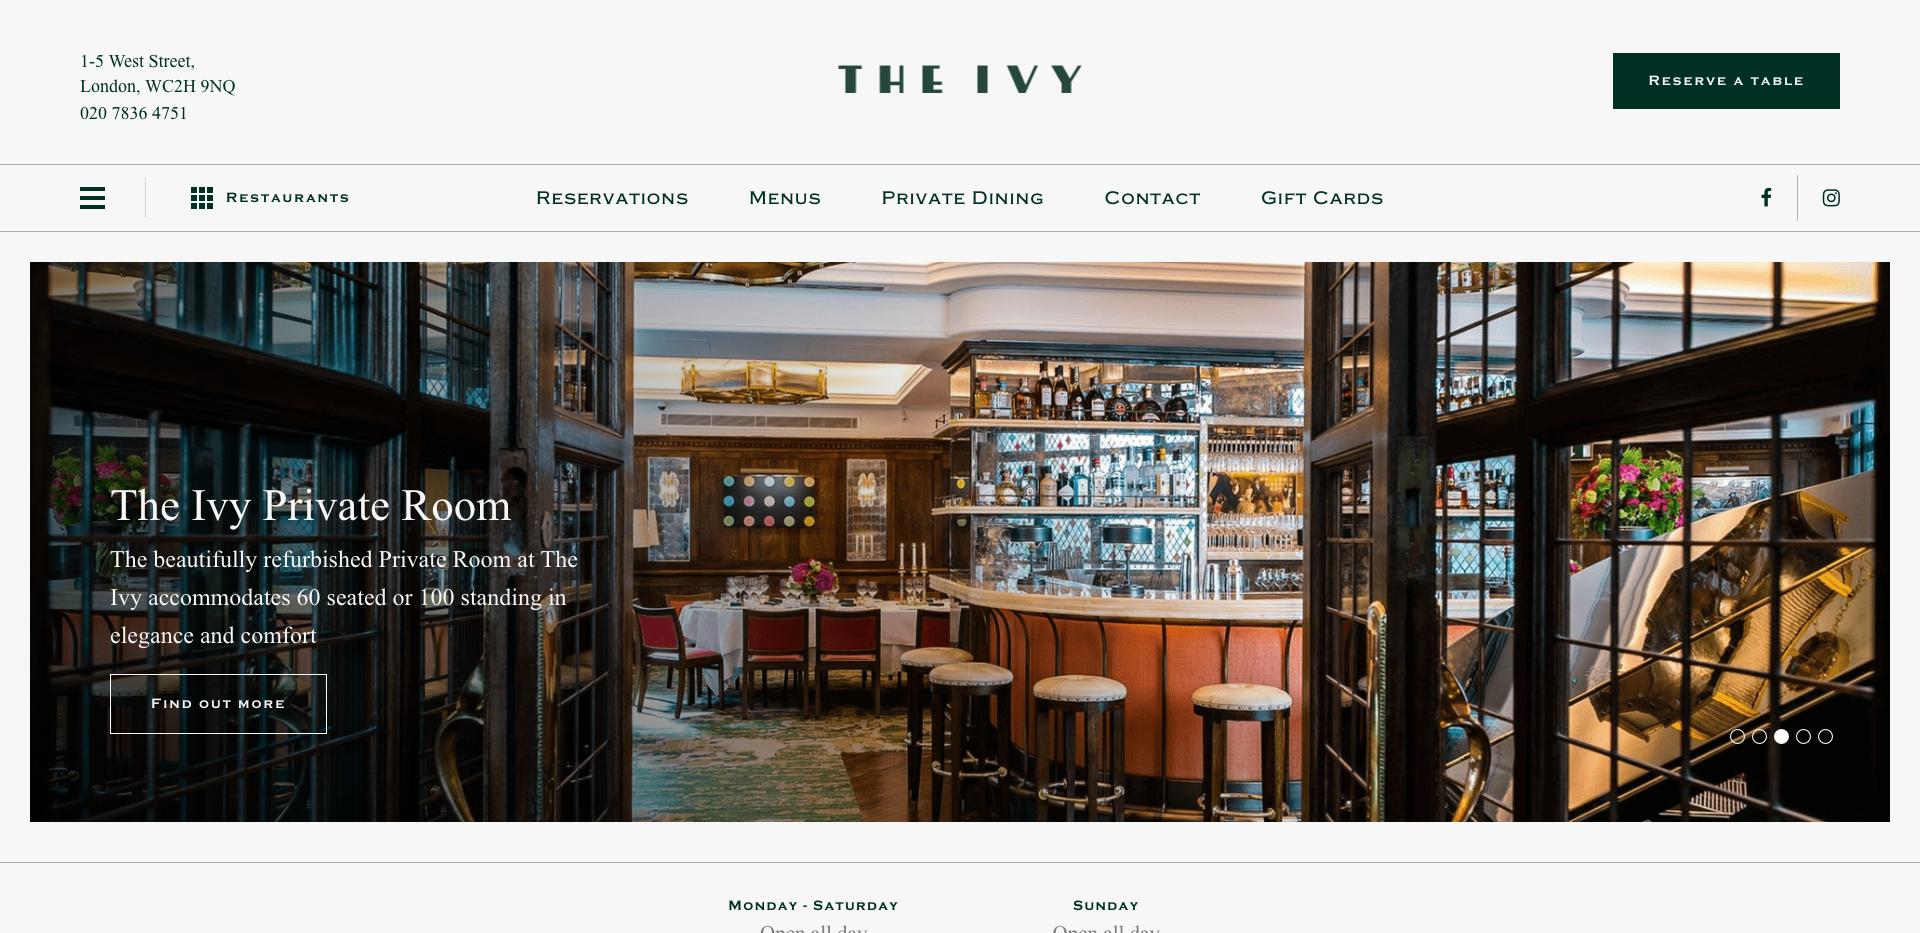 The Ivy England Restaurant Homepage Website Design